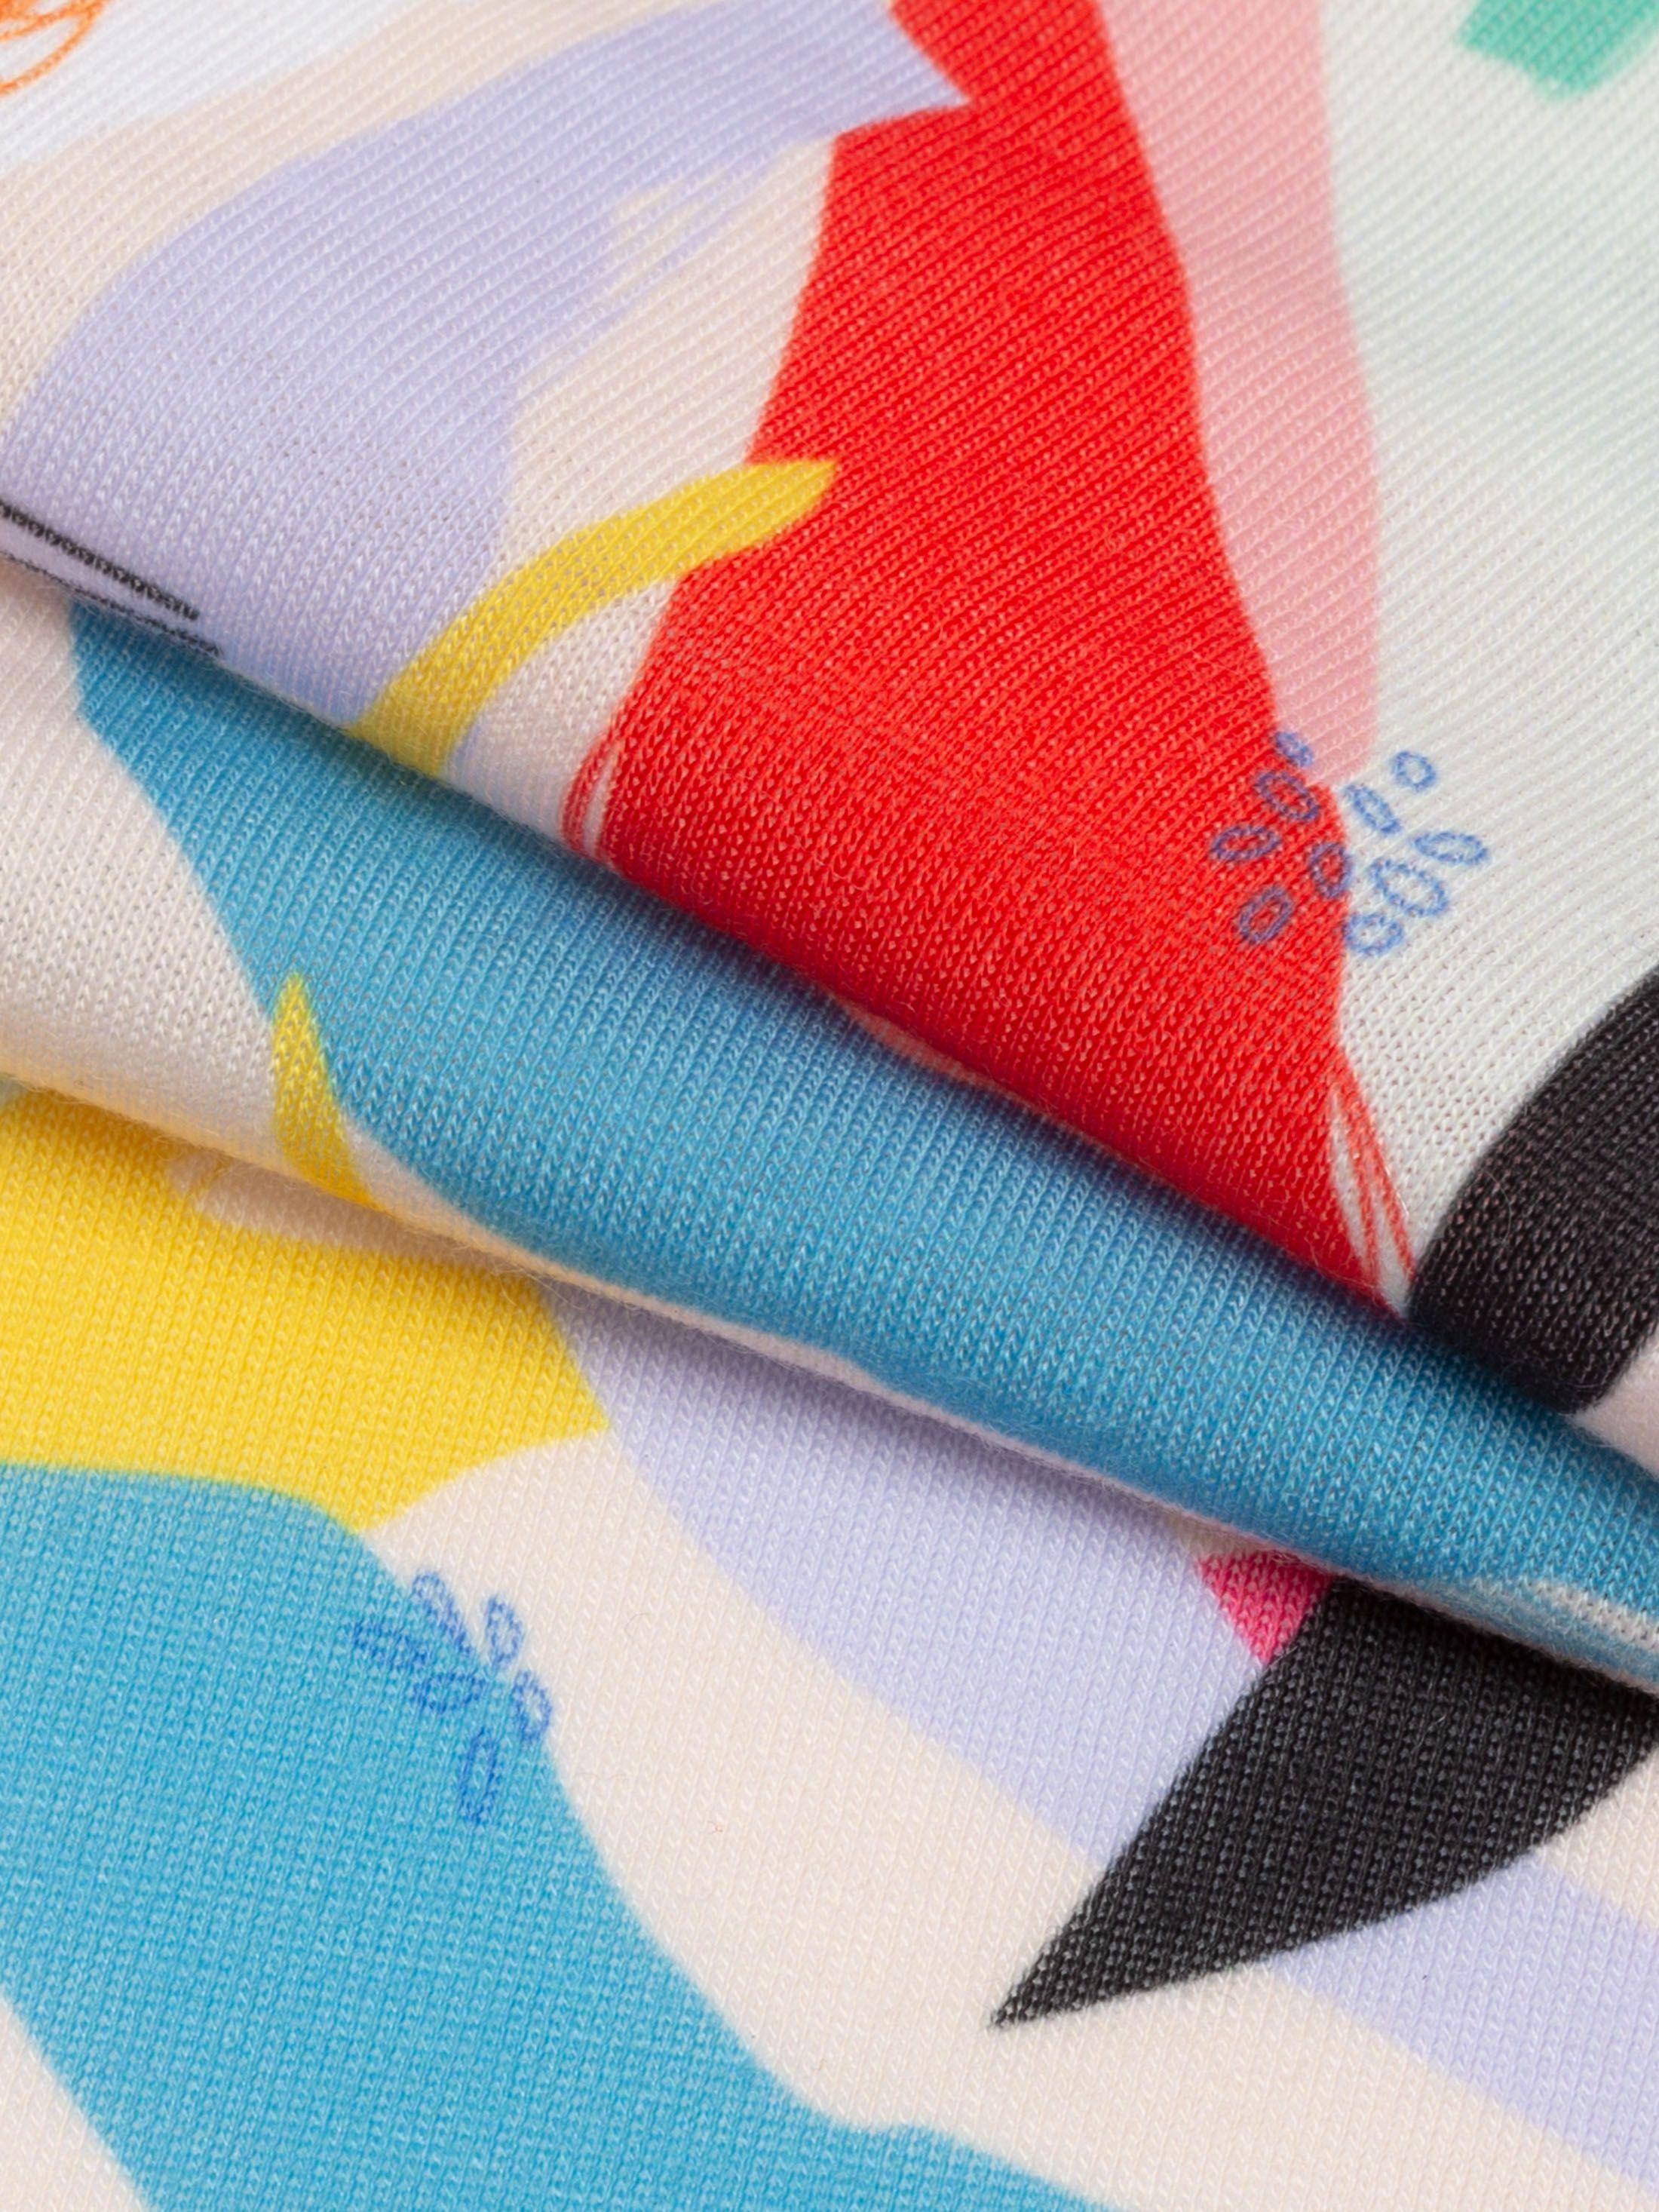 custom printed stretch jersey fabric edge options